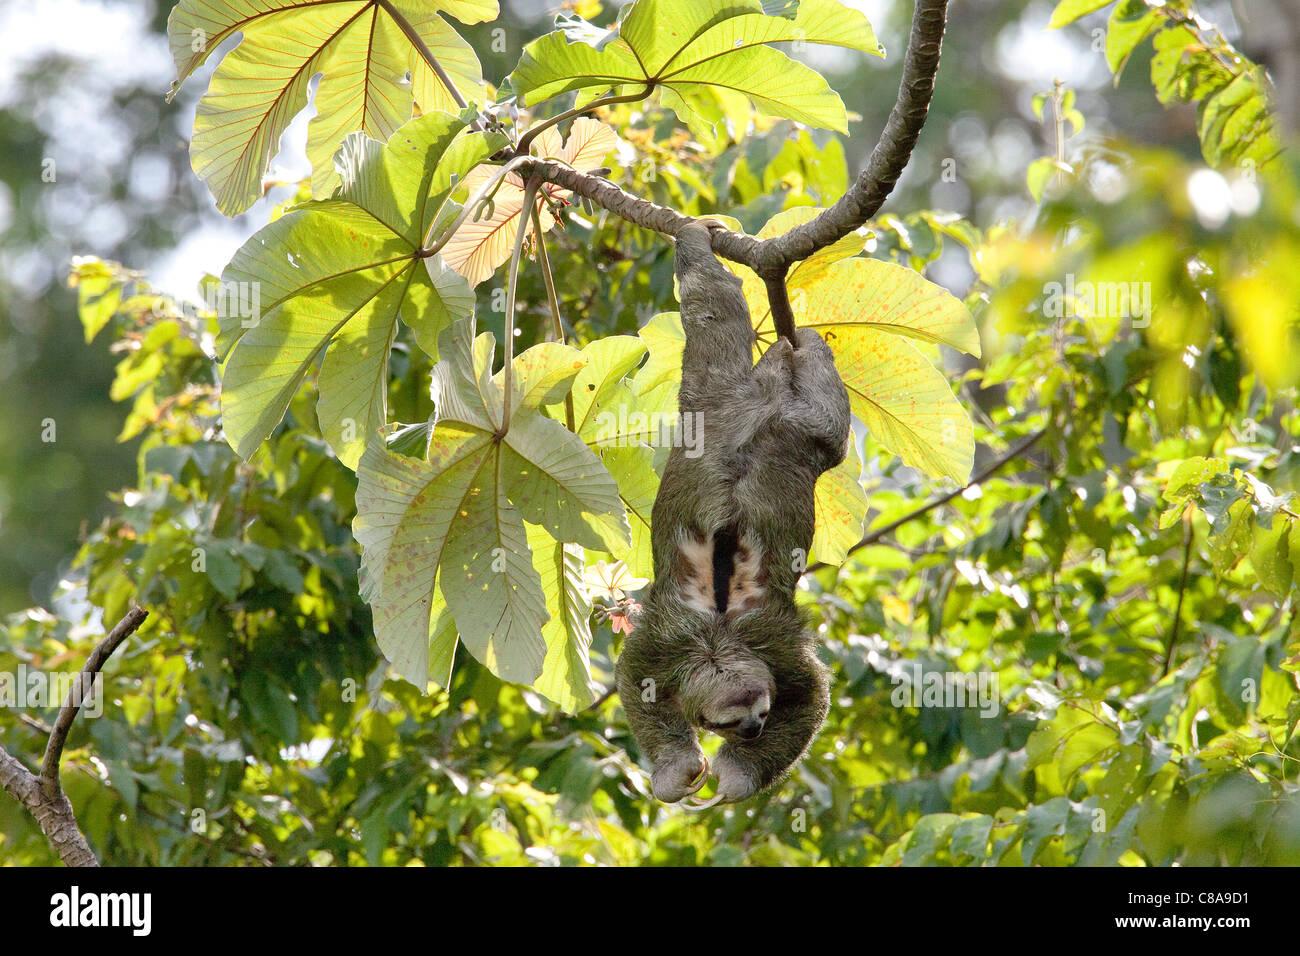 Three-toed Sloth, Costa Rica - Stock Image